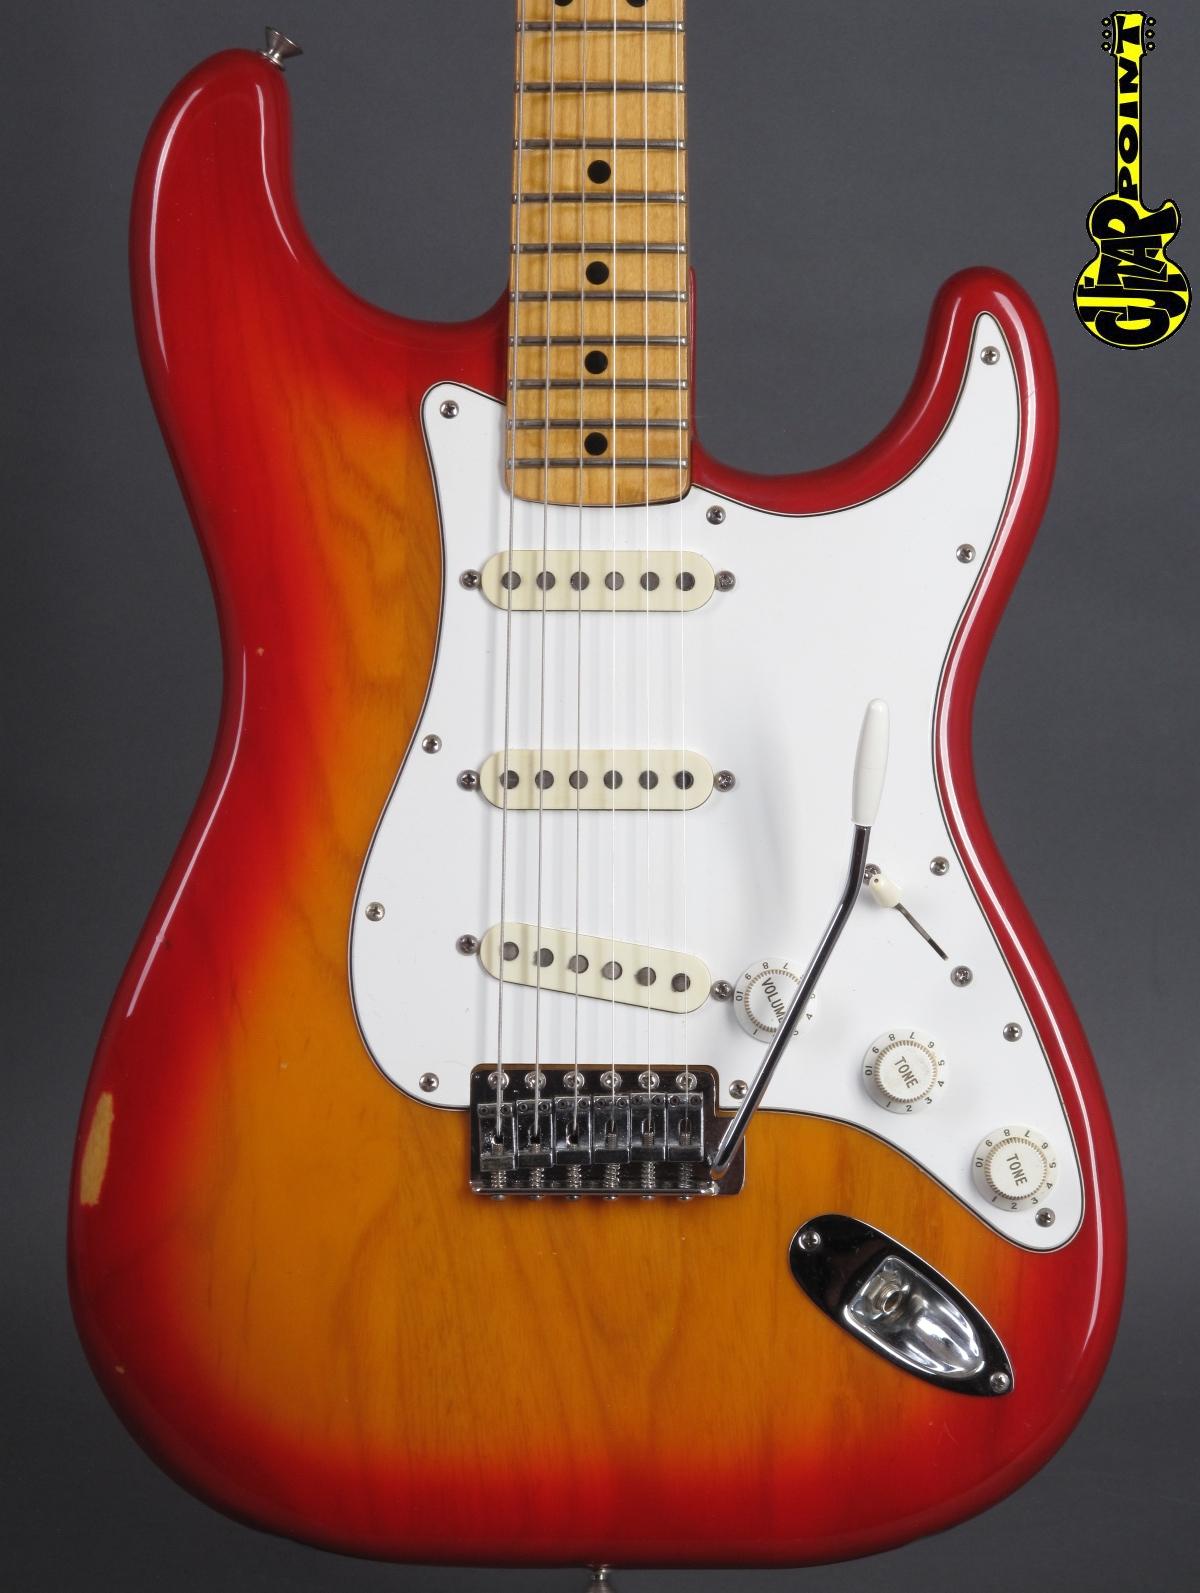 1981 Fender Stratocaster - Cherry Sunburst - Internional Color Series!